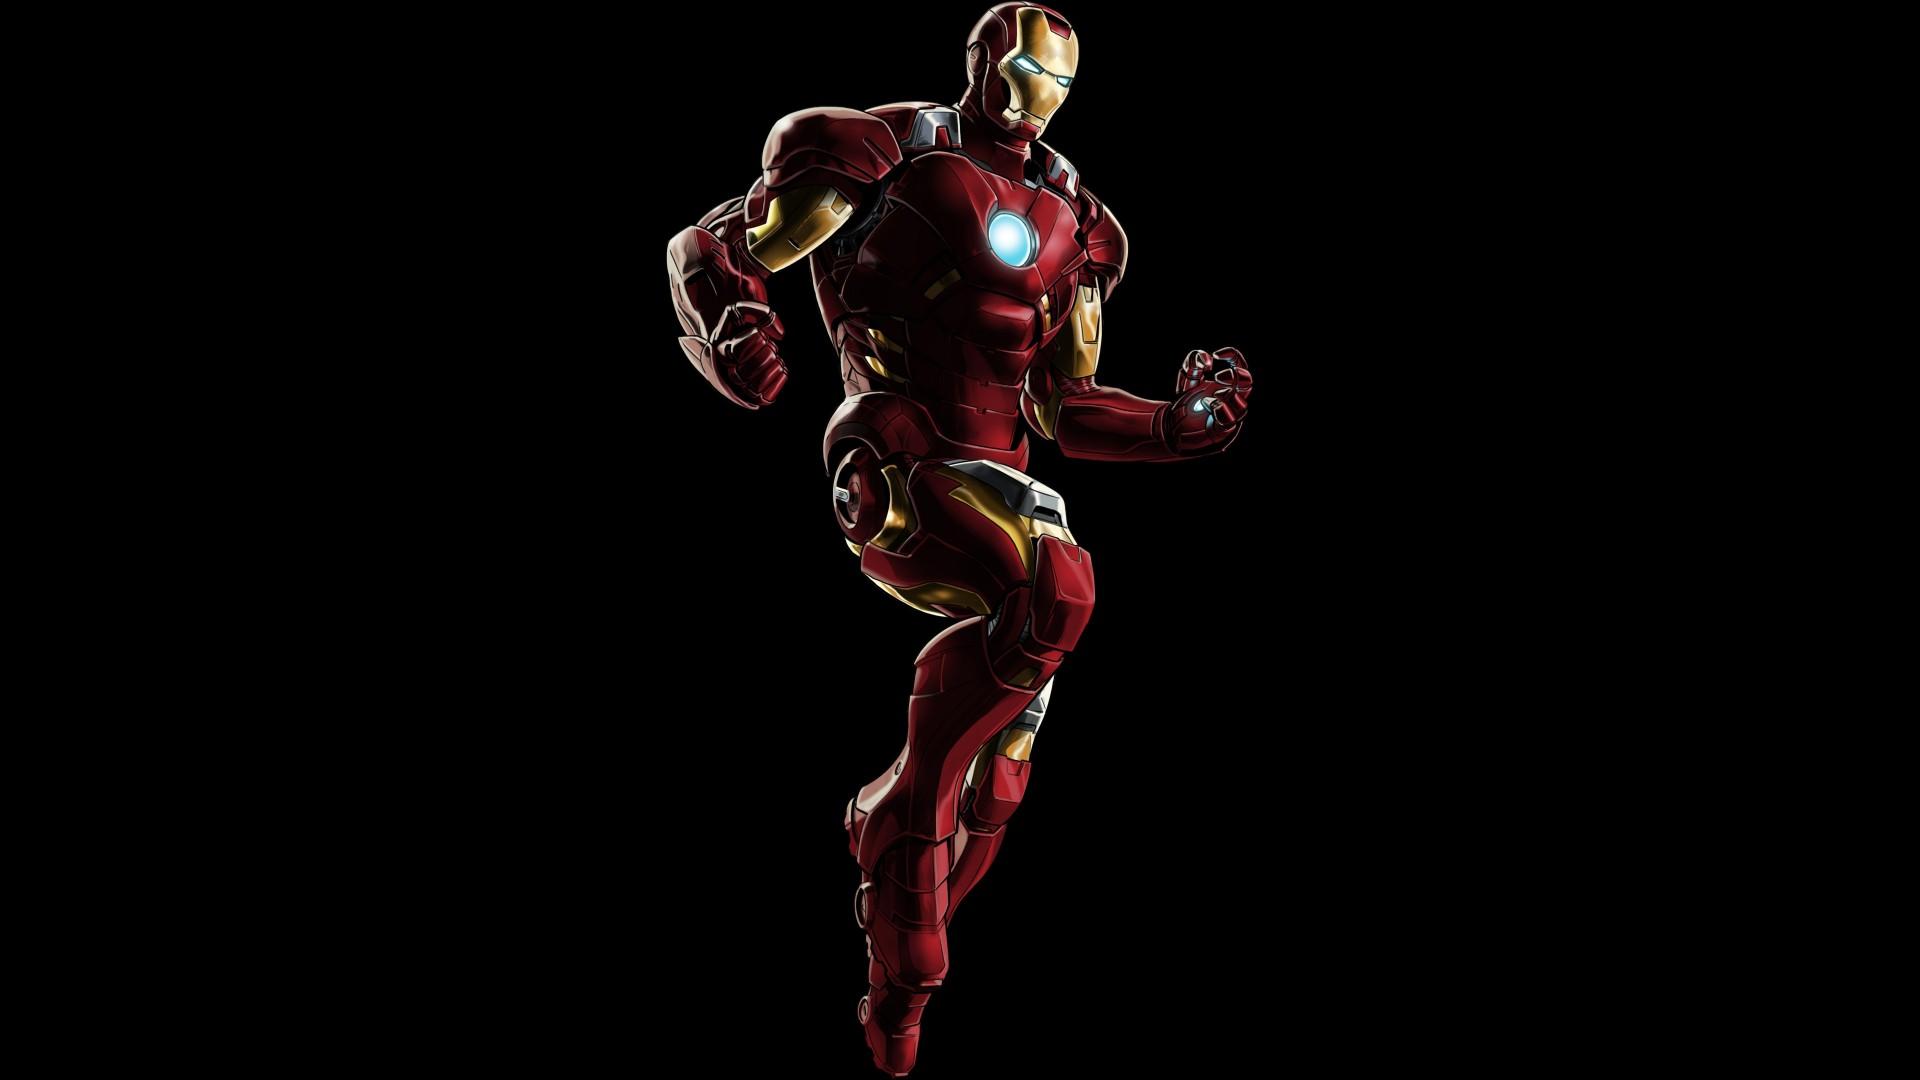 Iron Man Hd Wallpaper - Iron Man Love You 3000 - HD Wallpaper